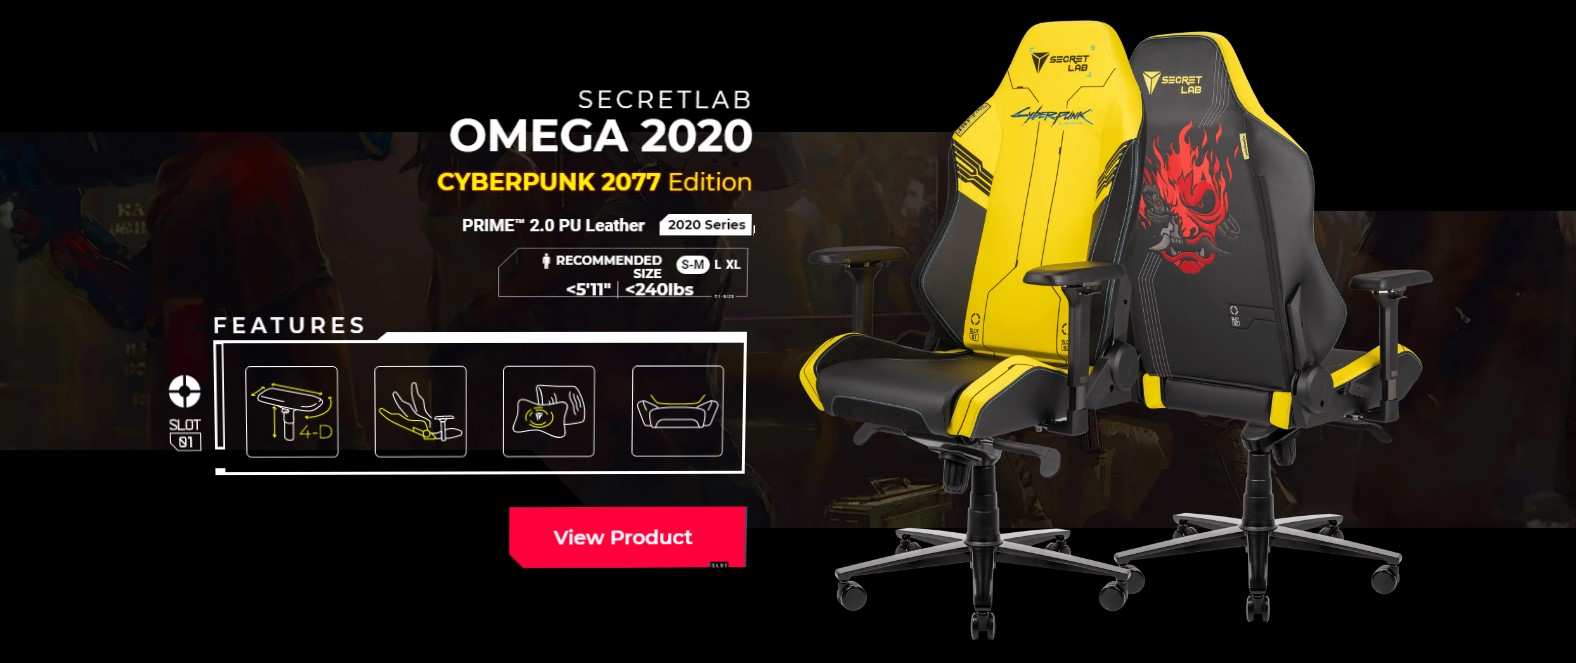 Secretlab x 《赛博朋克2077》电竞椅再次开卖 售价449美元起